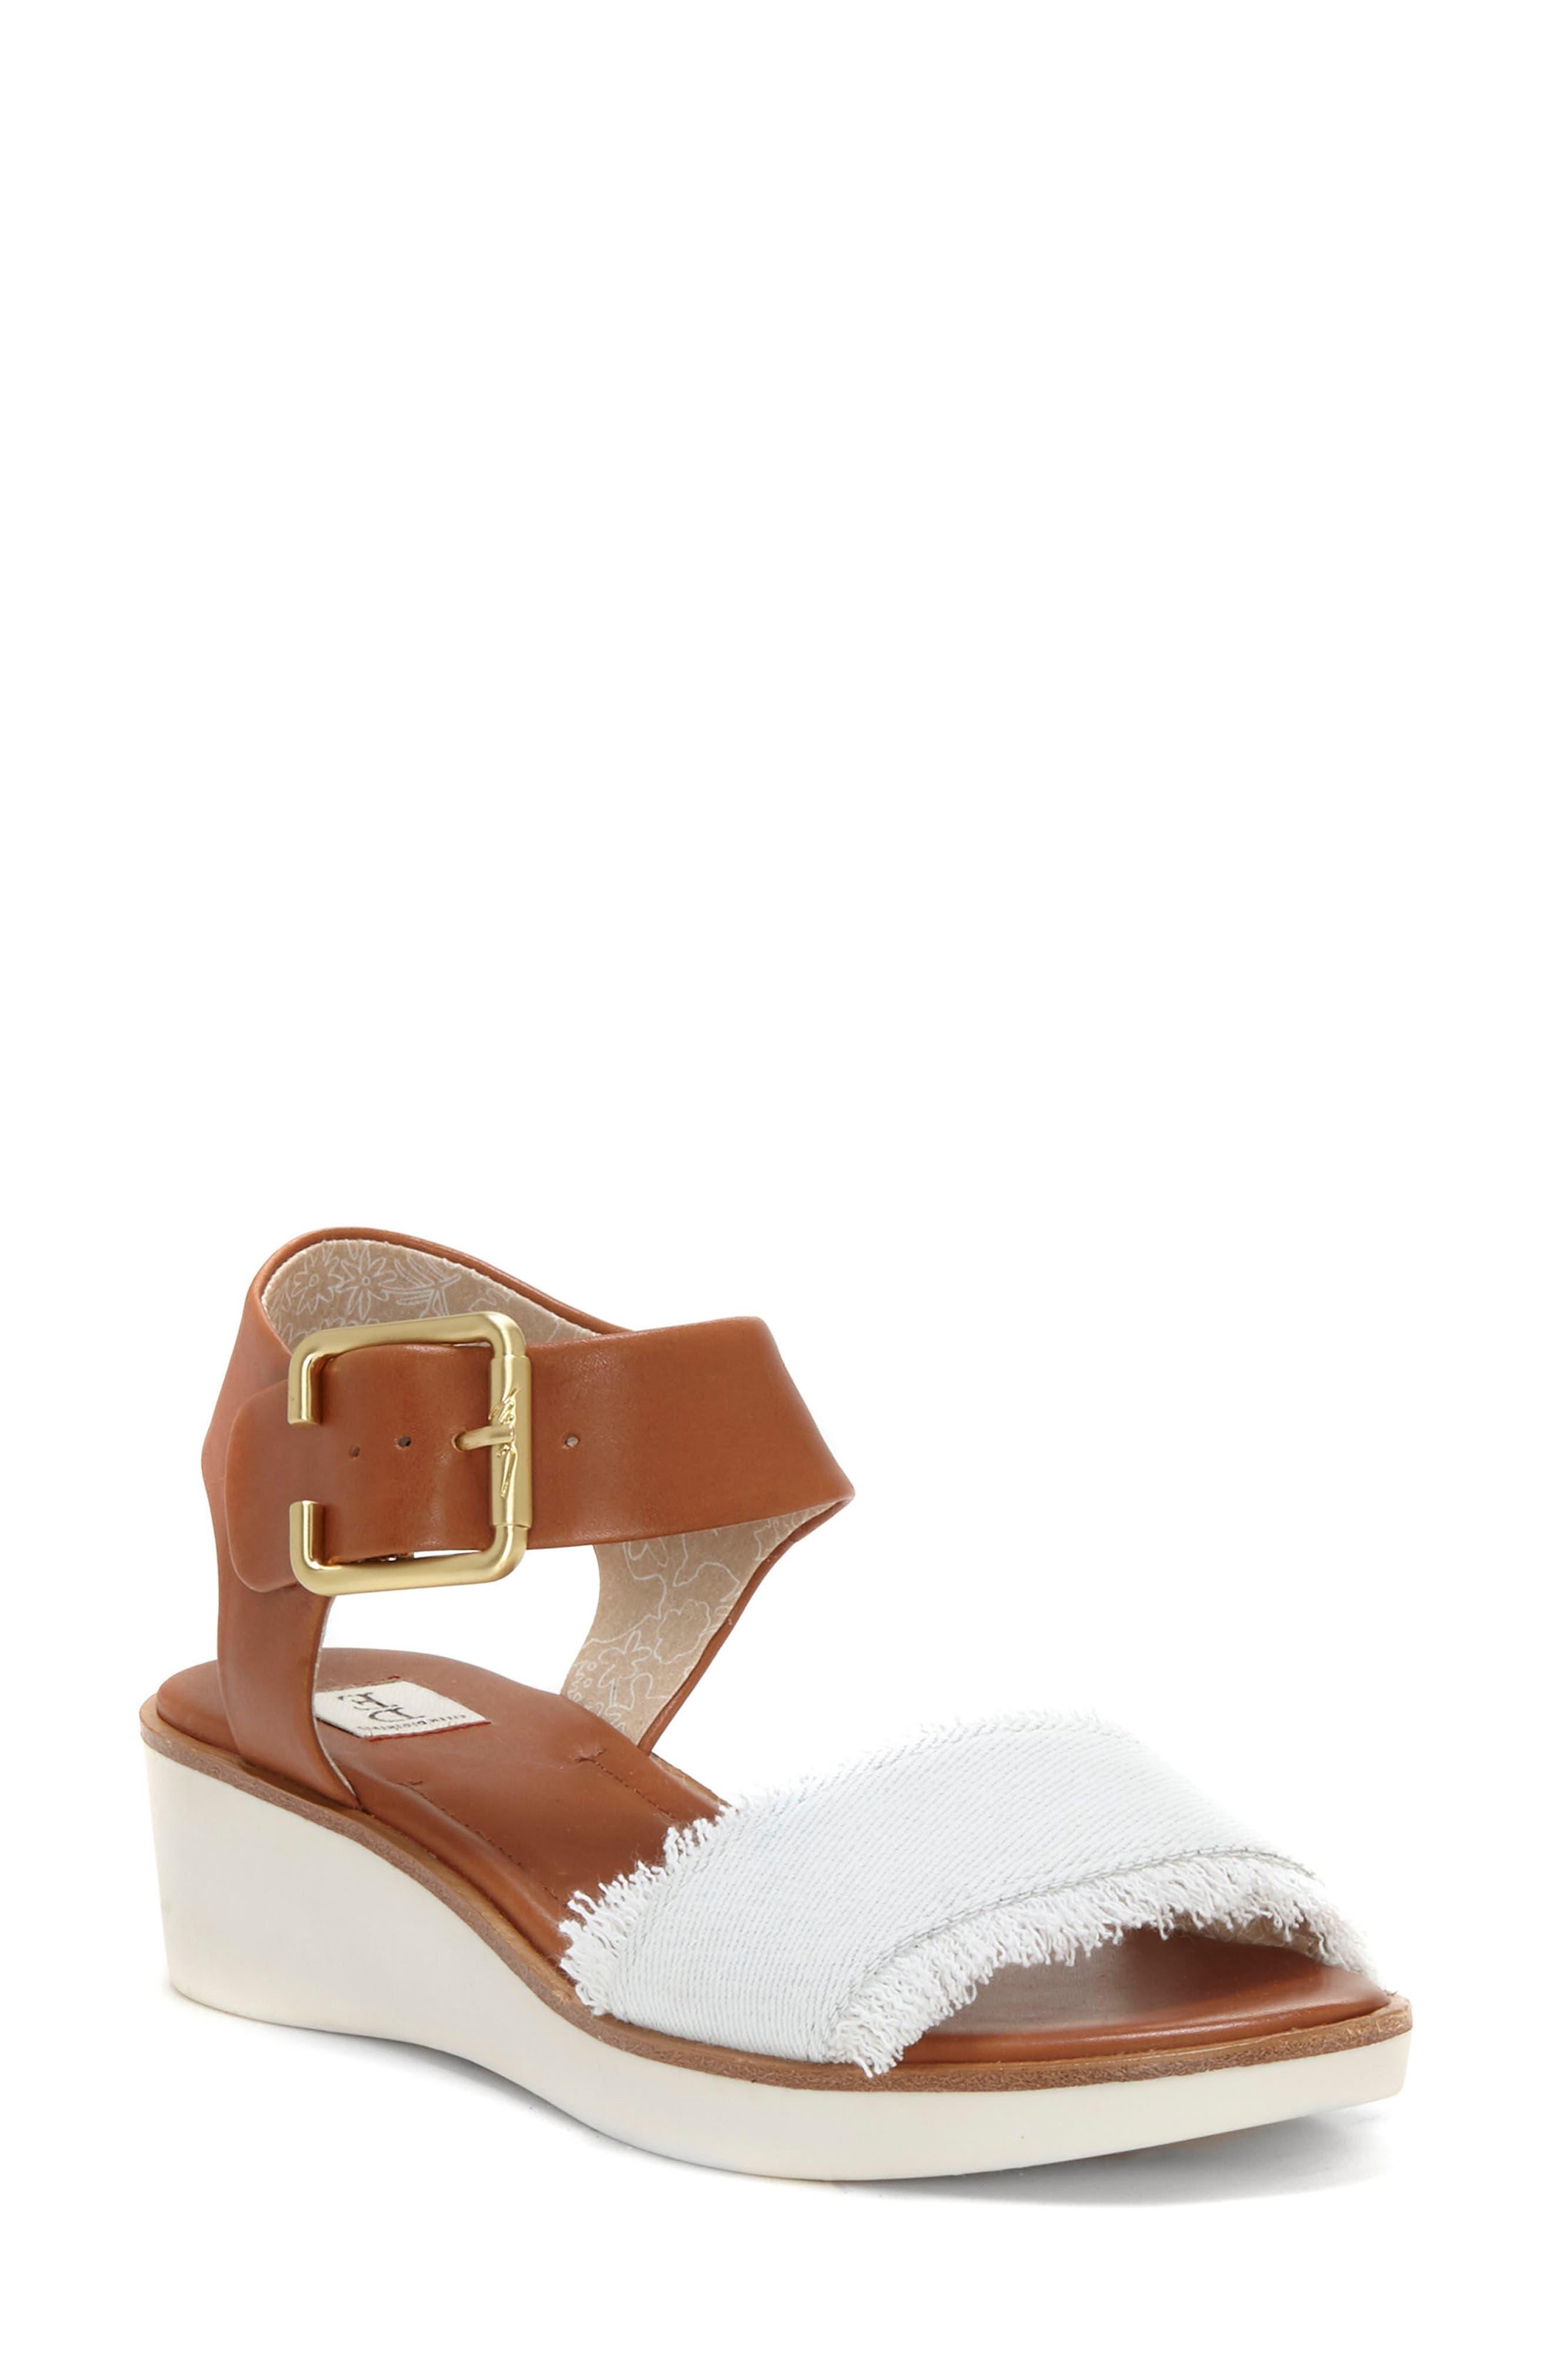 Satiana Sandal,                         Main,                         color, PURE WHITE DENIM FABRIC